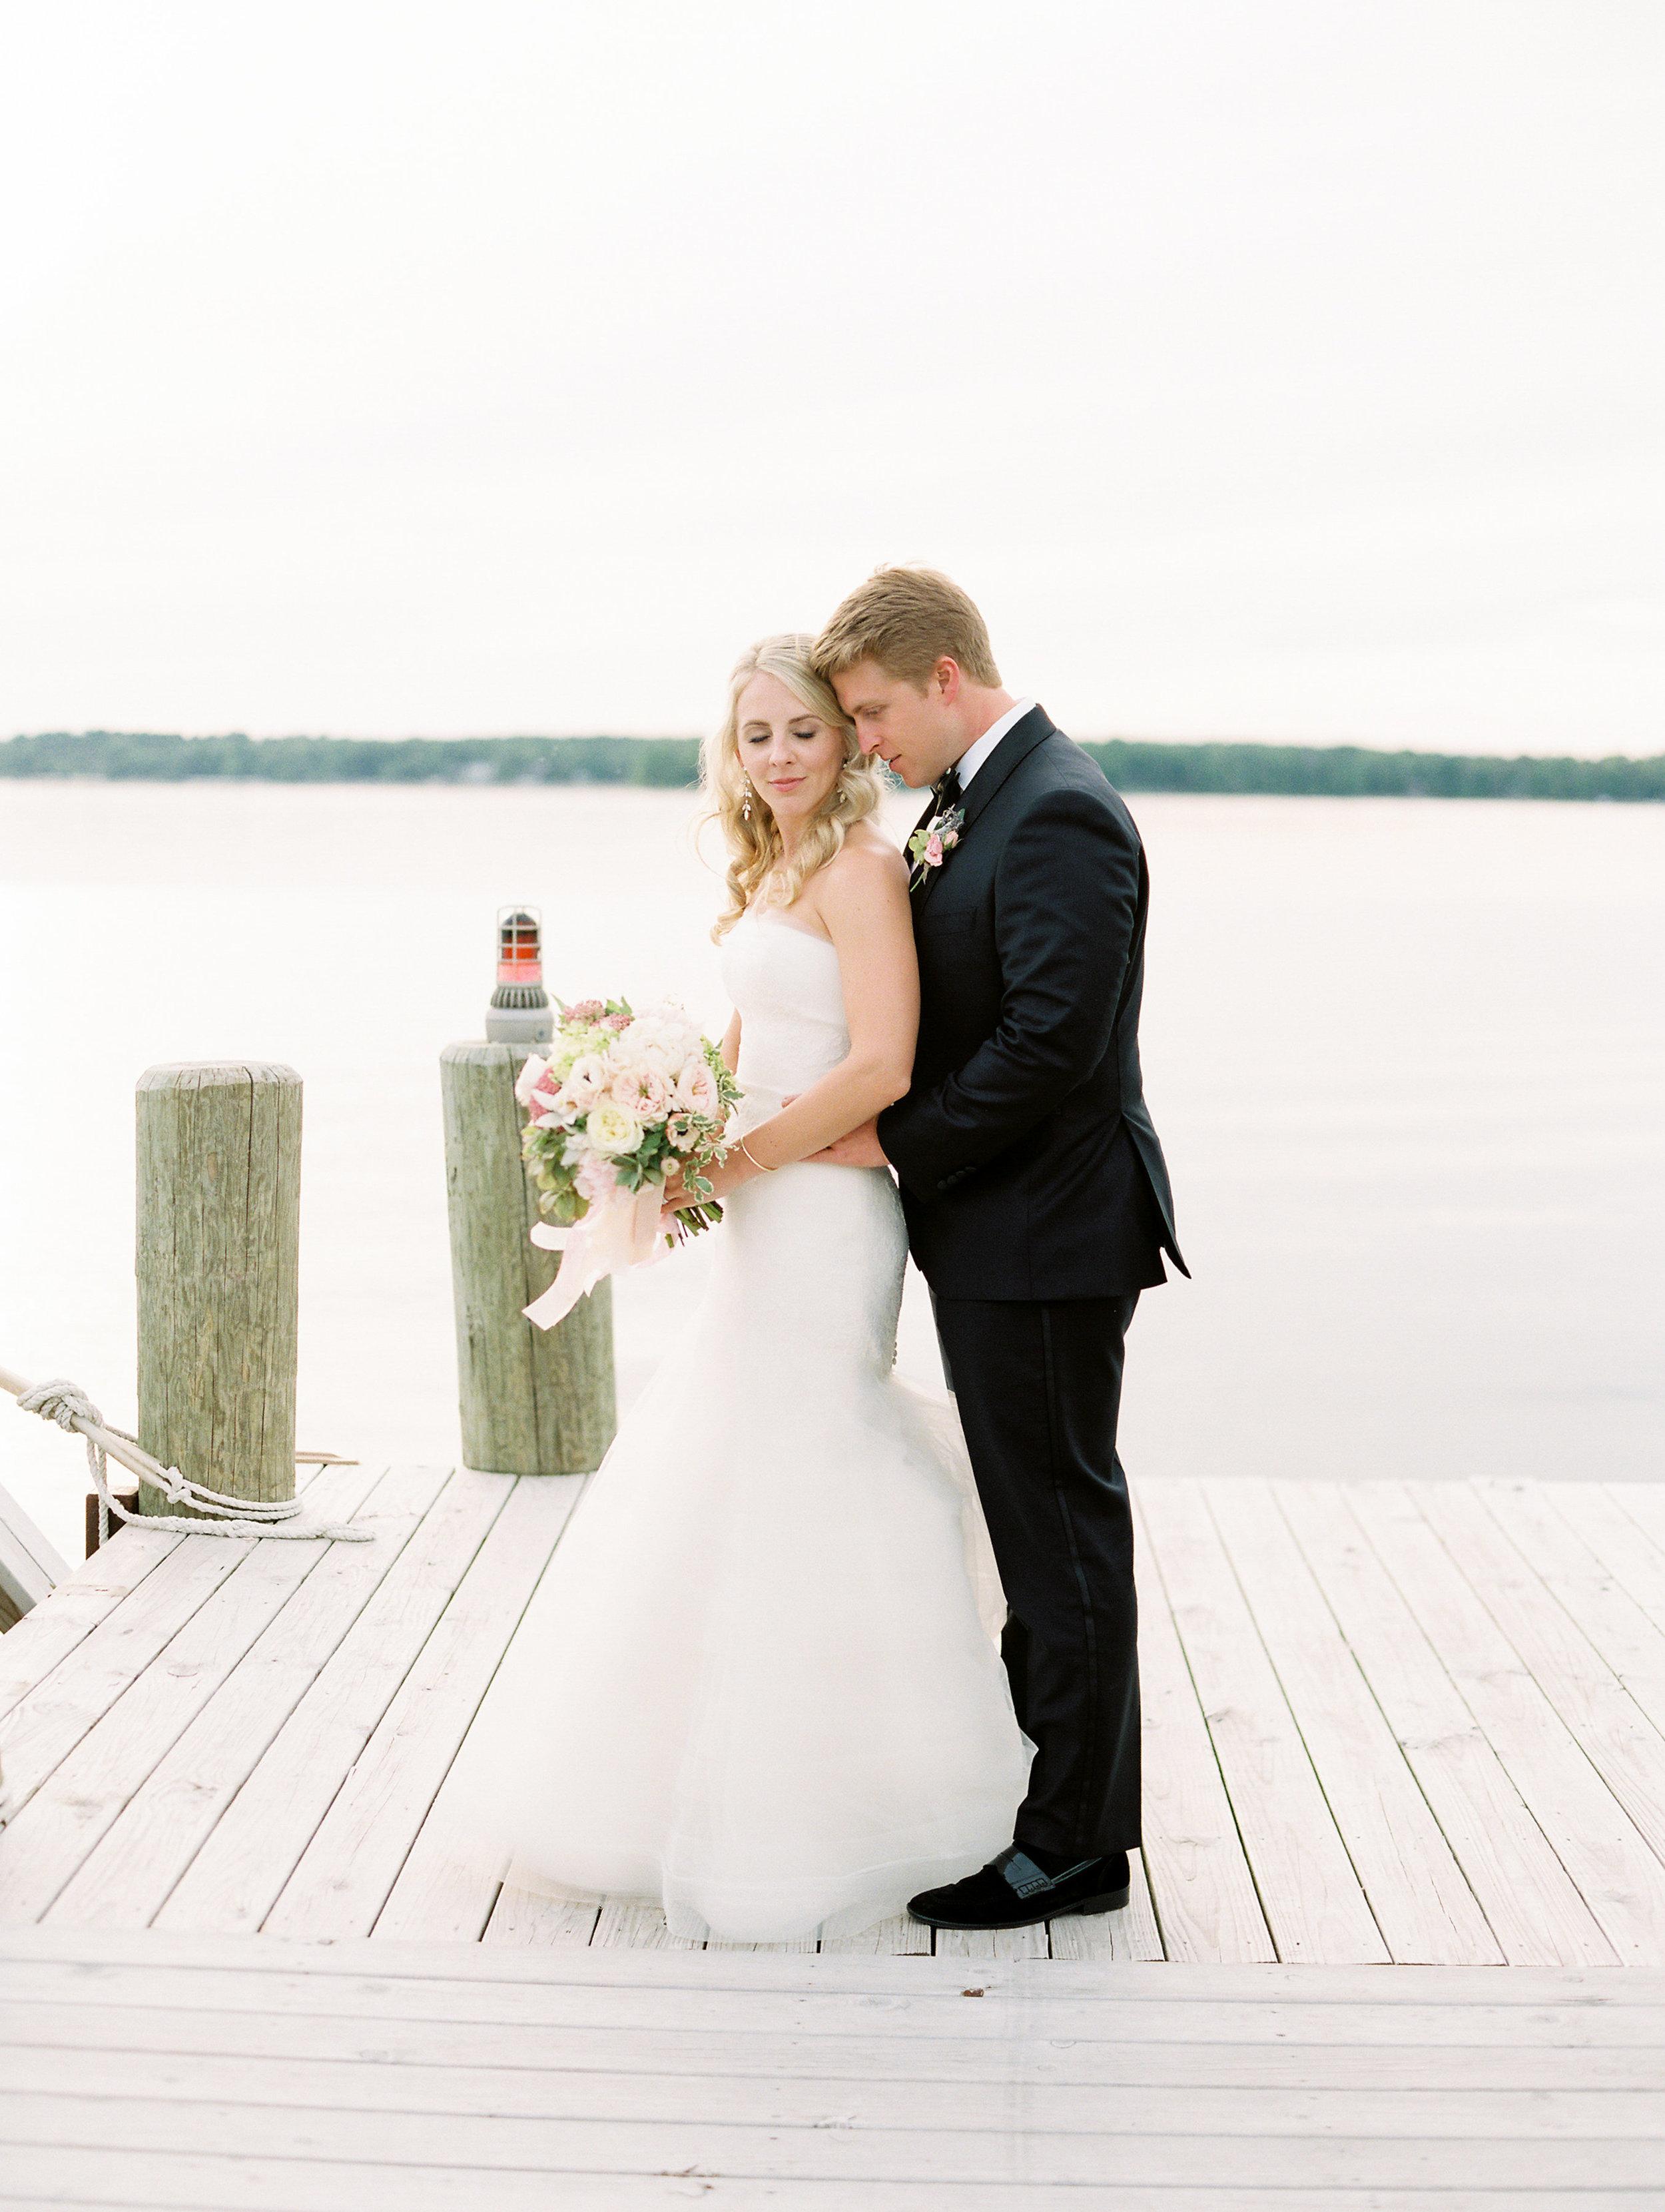 Coffman+Wedding+Bride+Groom+Sunset-70.jpg